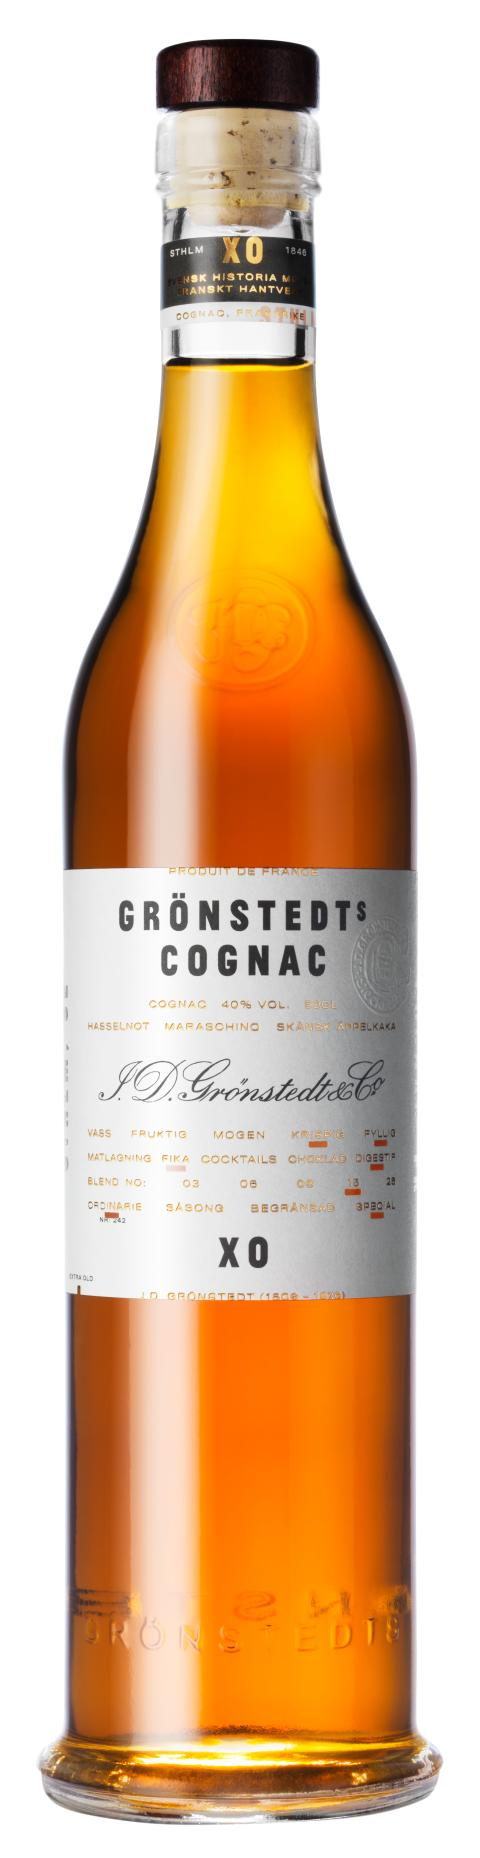 Grönstedts Cognac XO